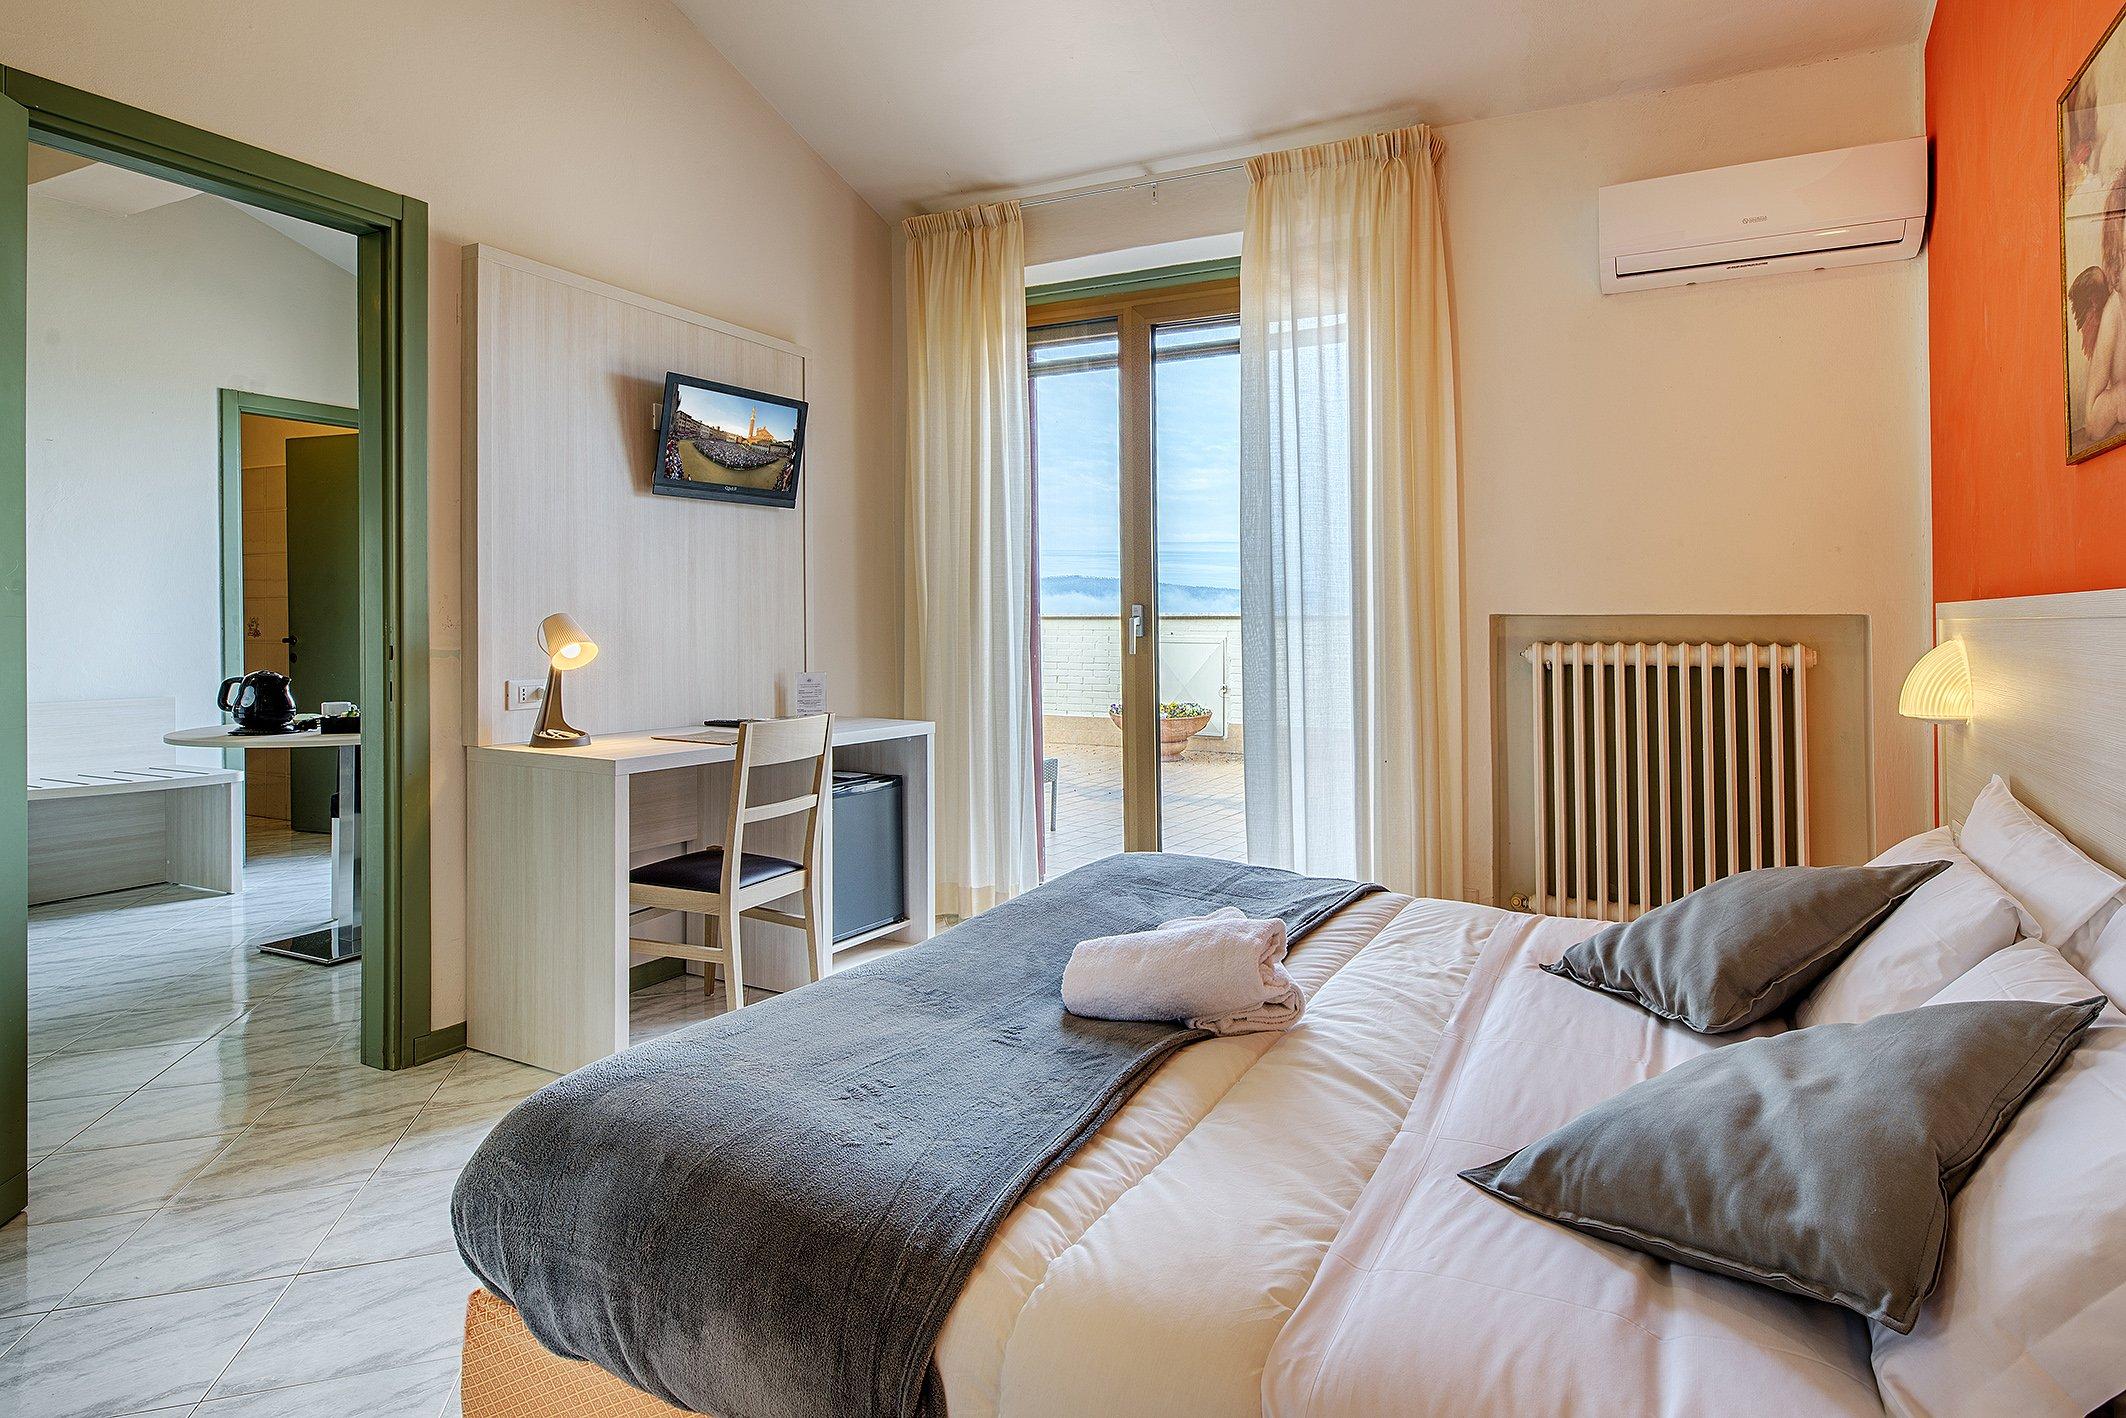 Offerta Weekend Romantico in Suite a Siena